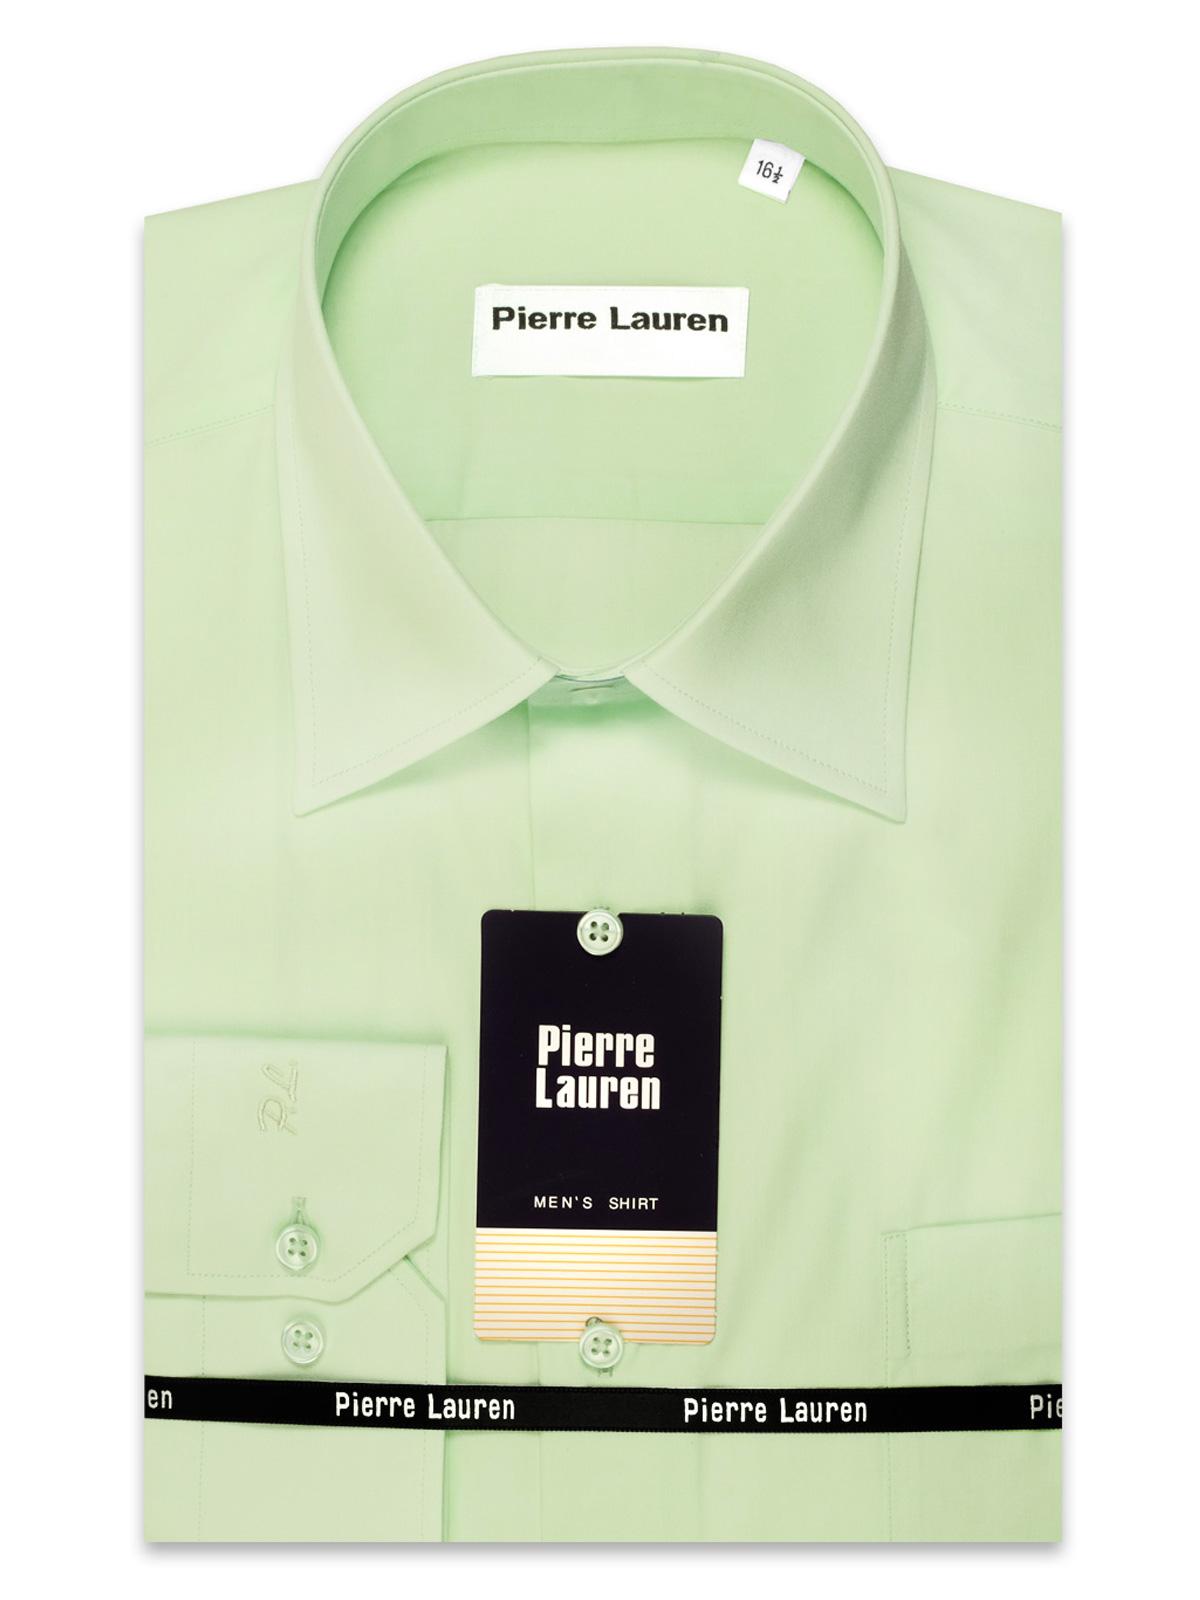 PIERRE LAUREN (CLASSIC)  арт.- 4353ТРЦ